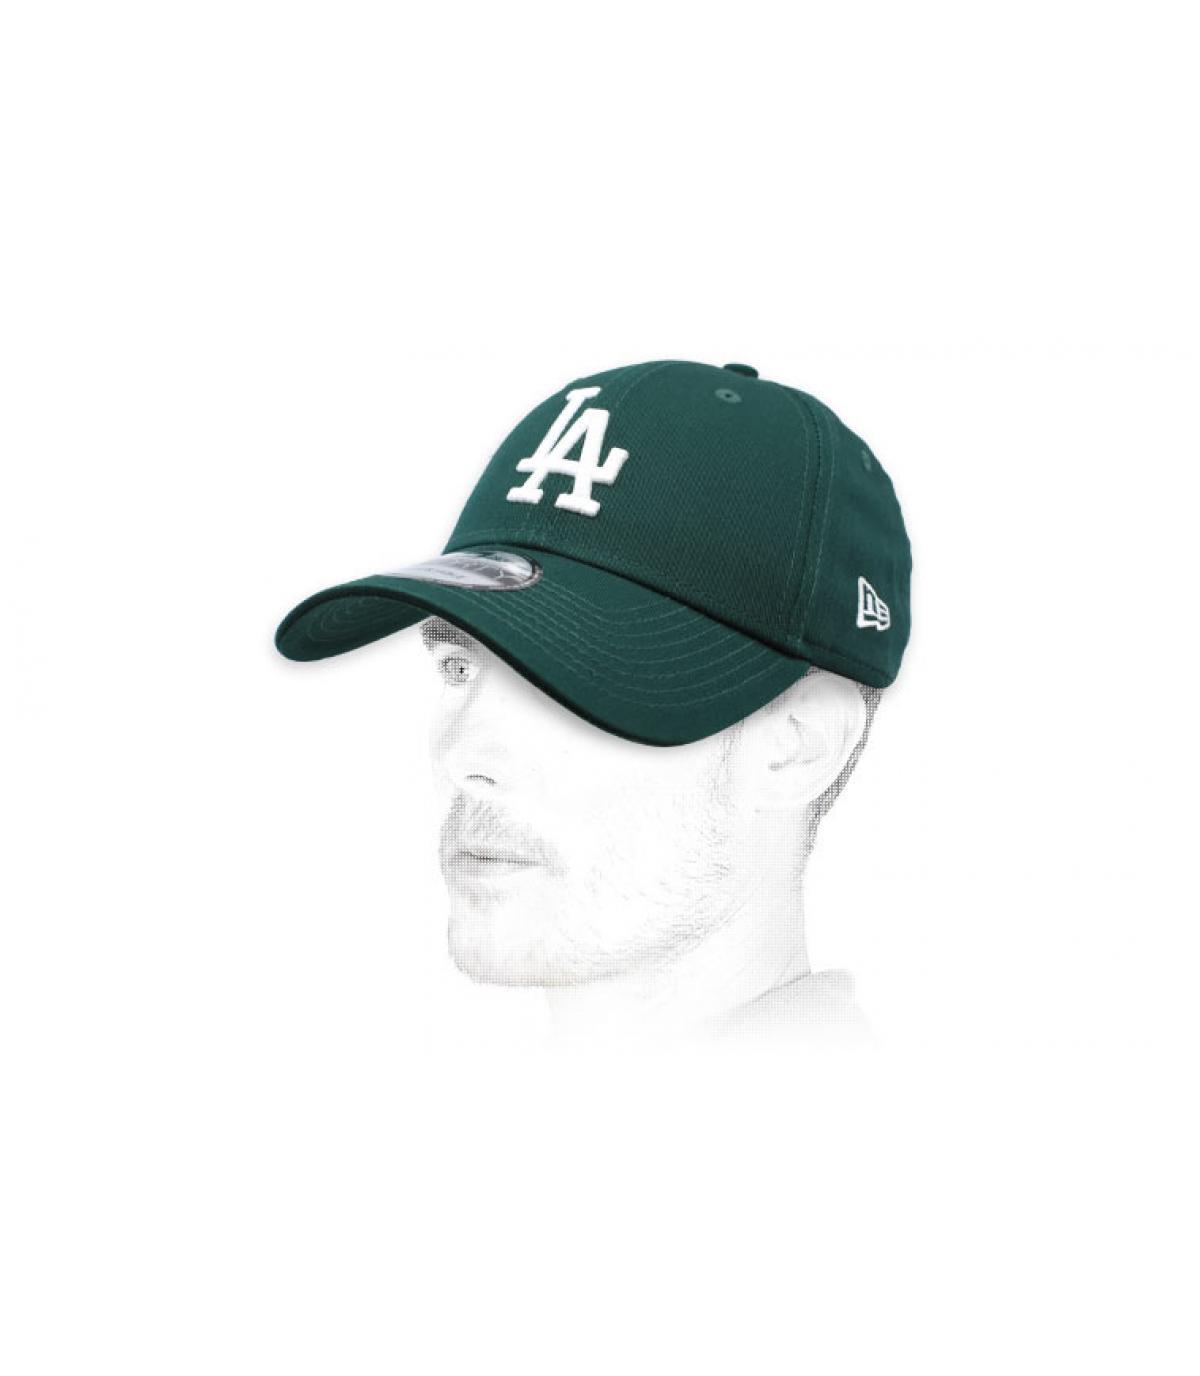 gorra LA verde